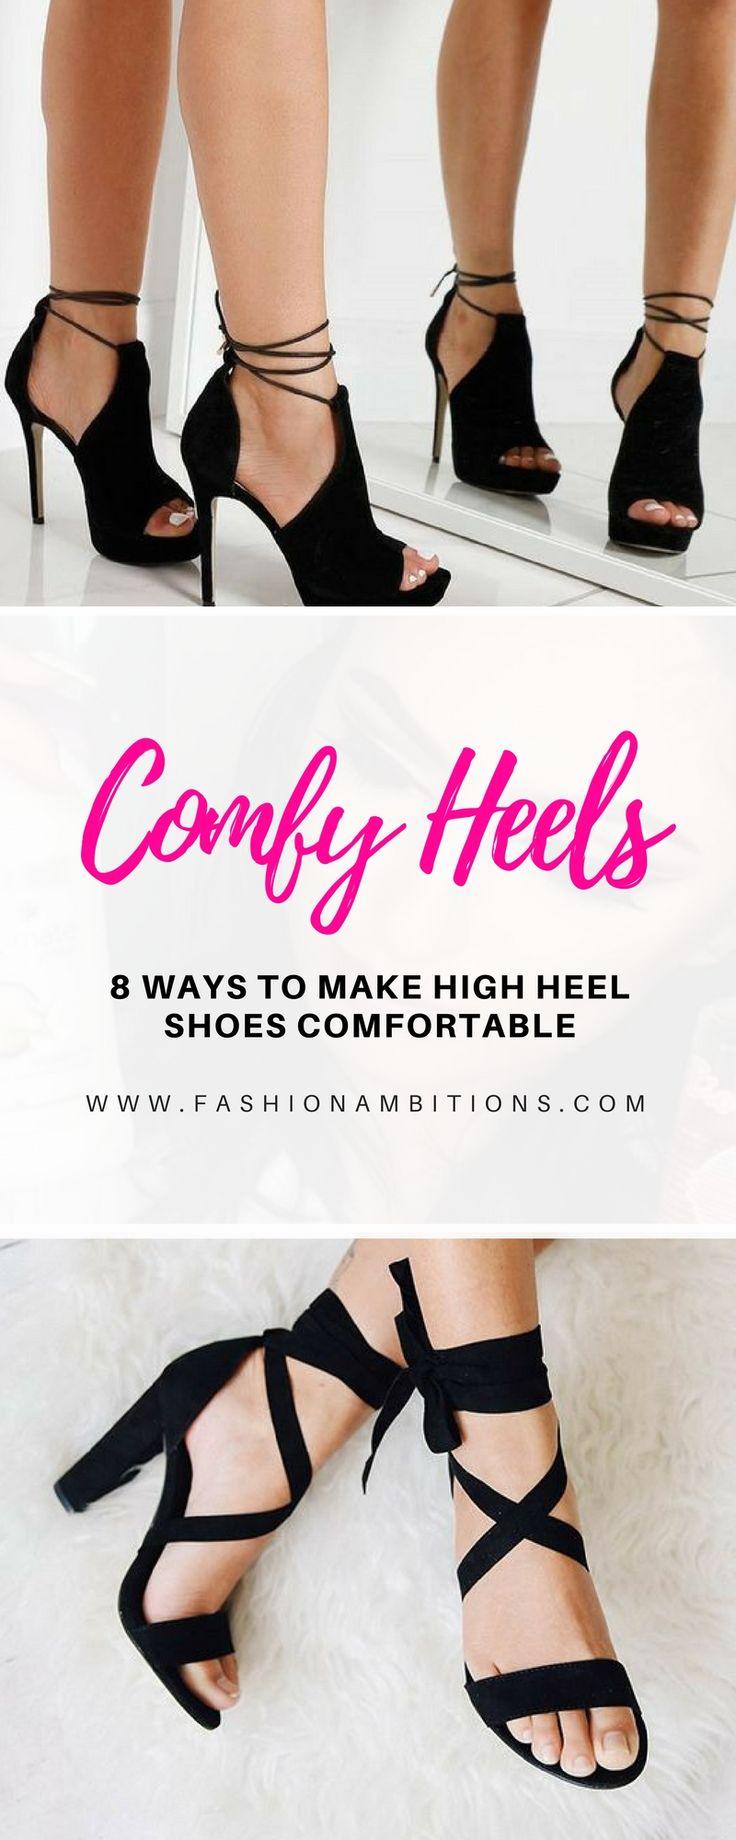 8 Ways to Make High Heel Shoes Comfortable